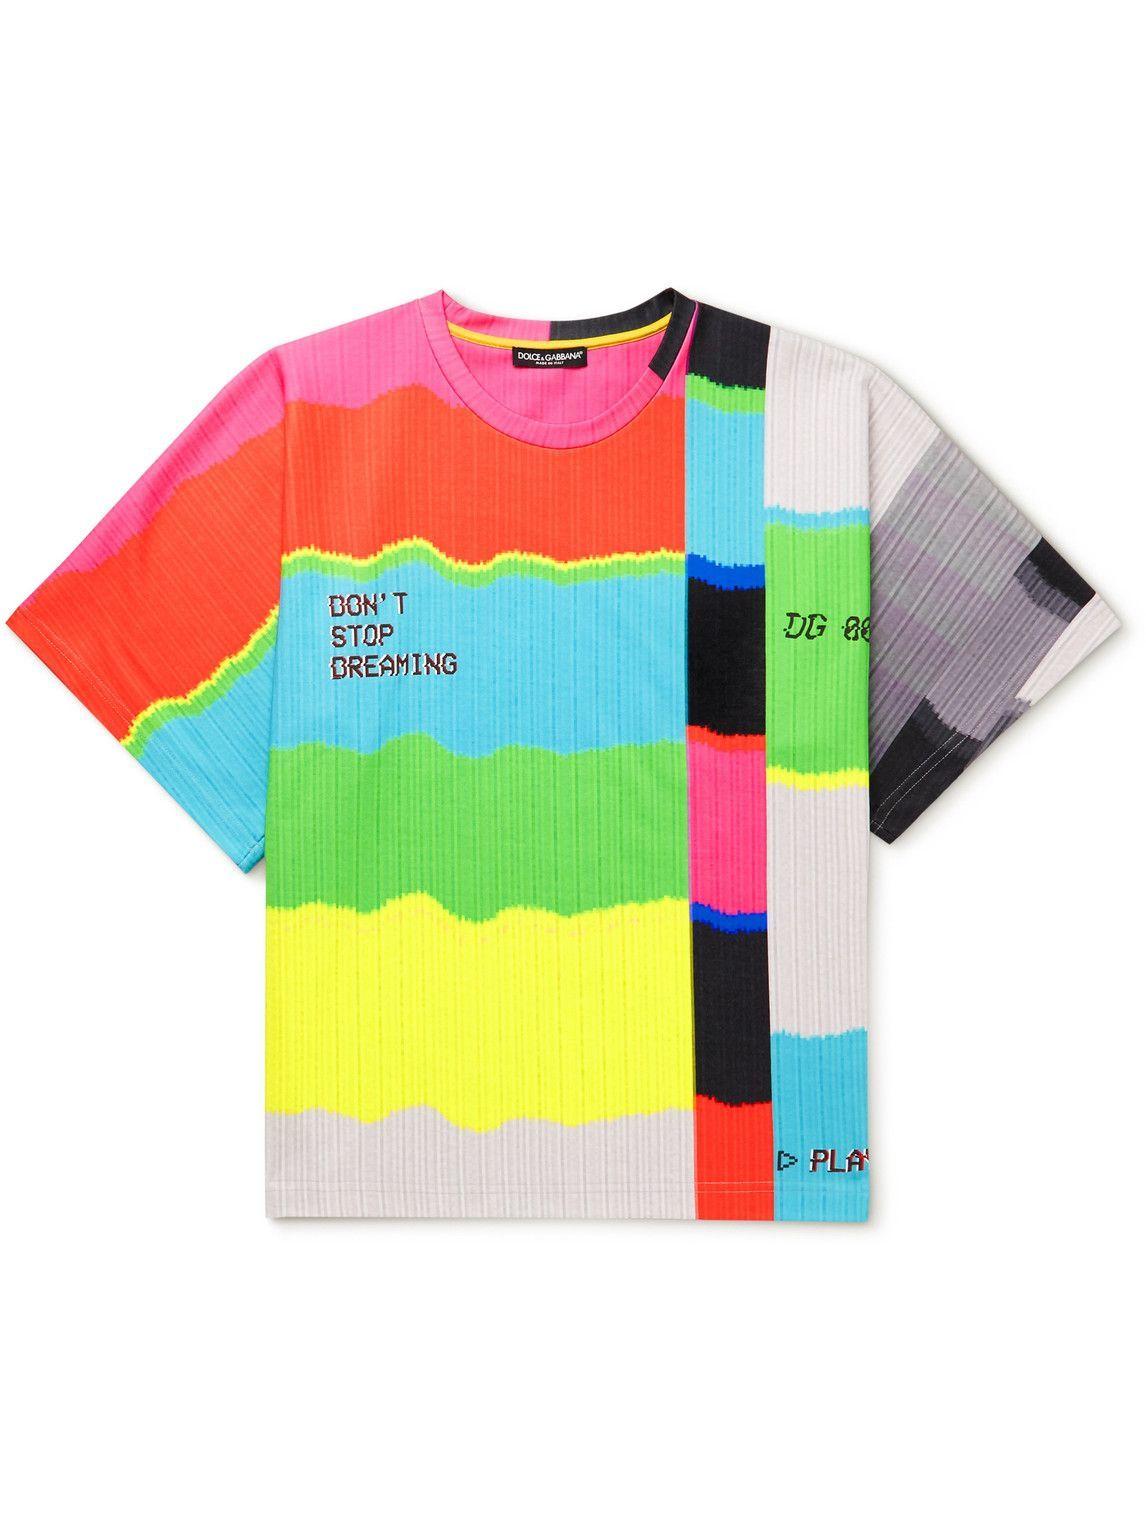 Photo: Dolce & Gabbana - Printed Cotton-Blend Jersey T-Shirt - Multi